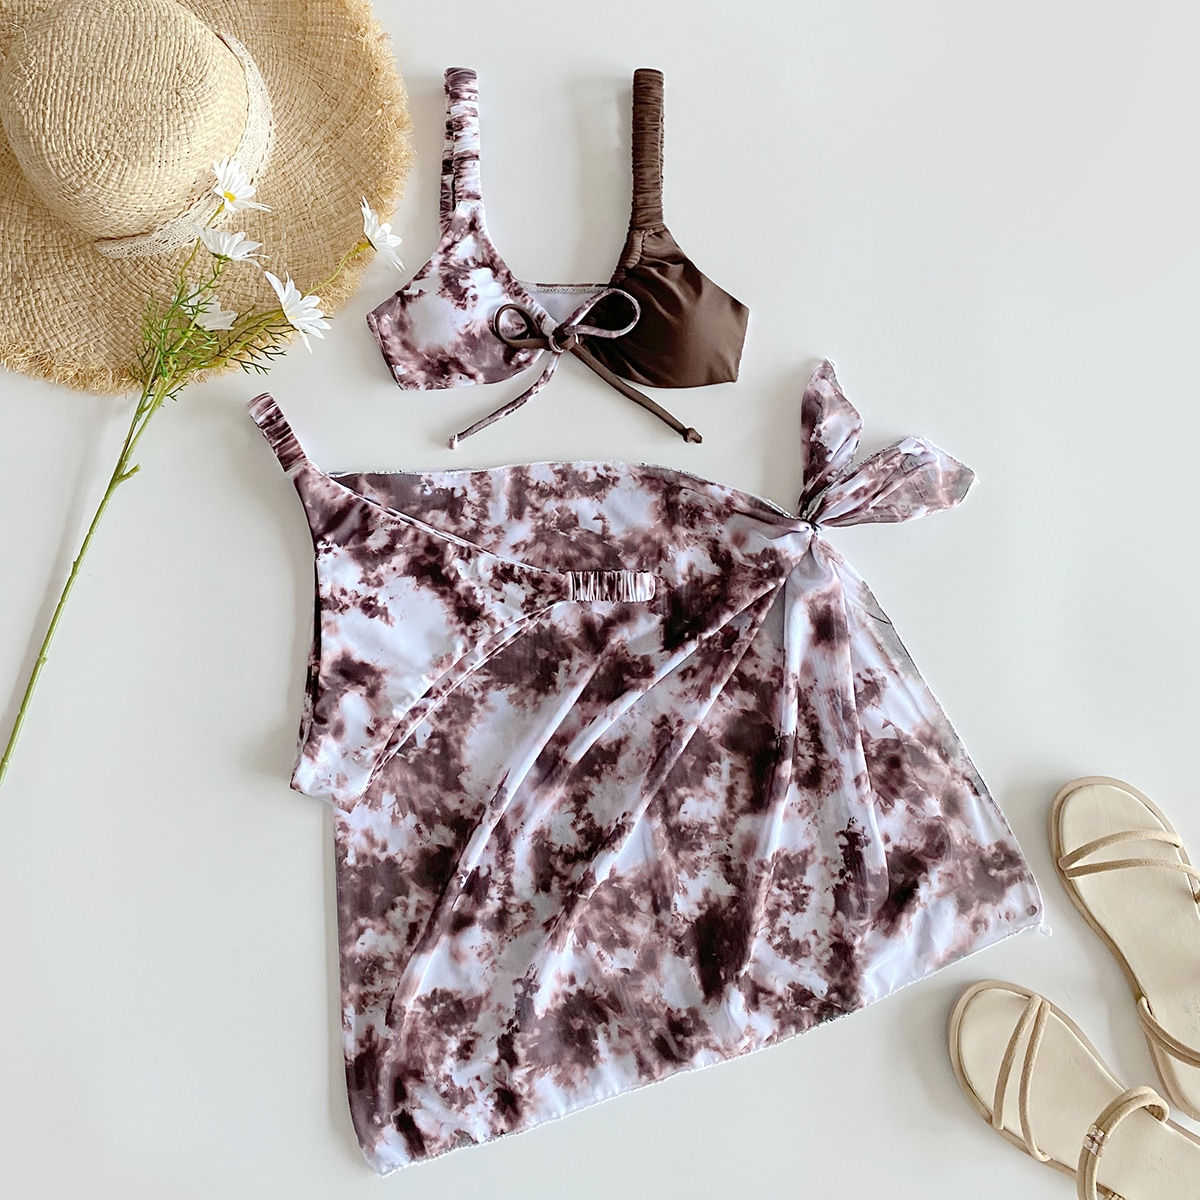 SHEIN / 3pack Tie Dye Knot Bikini Swimsuit & Beach Skirt